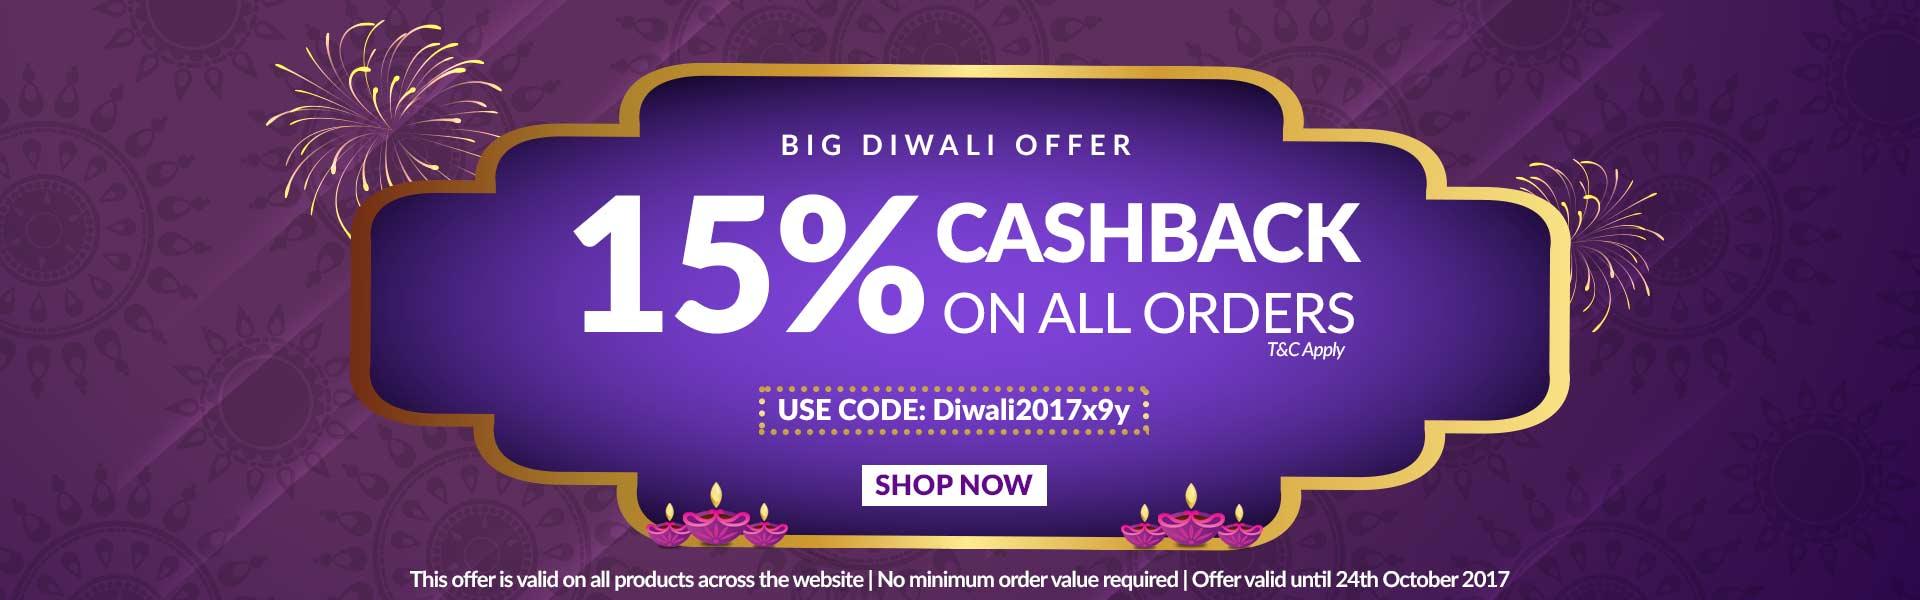 Diwali Gifts 2017